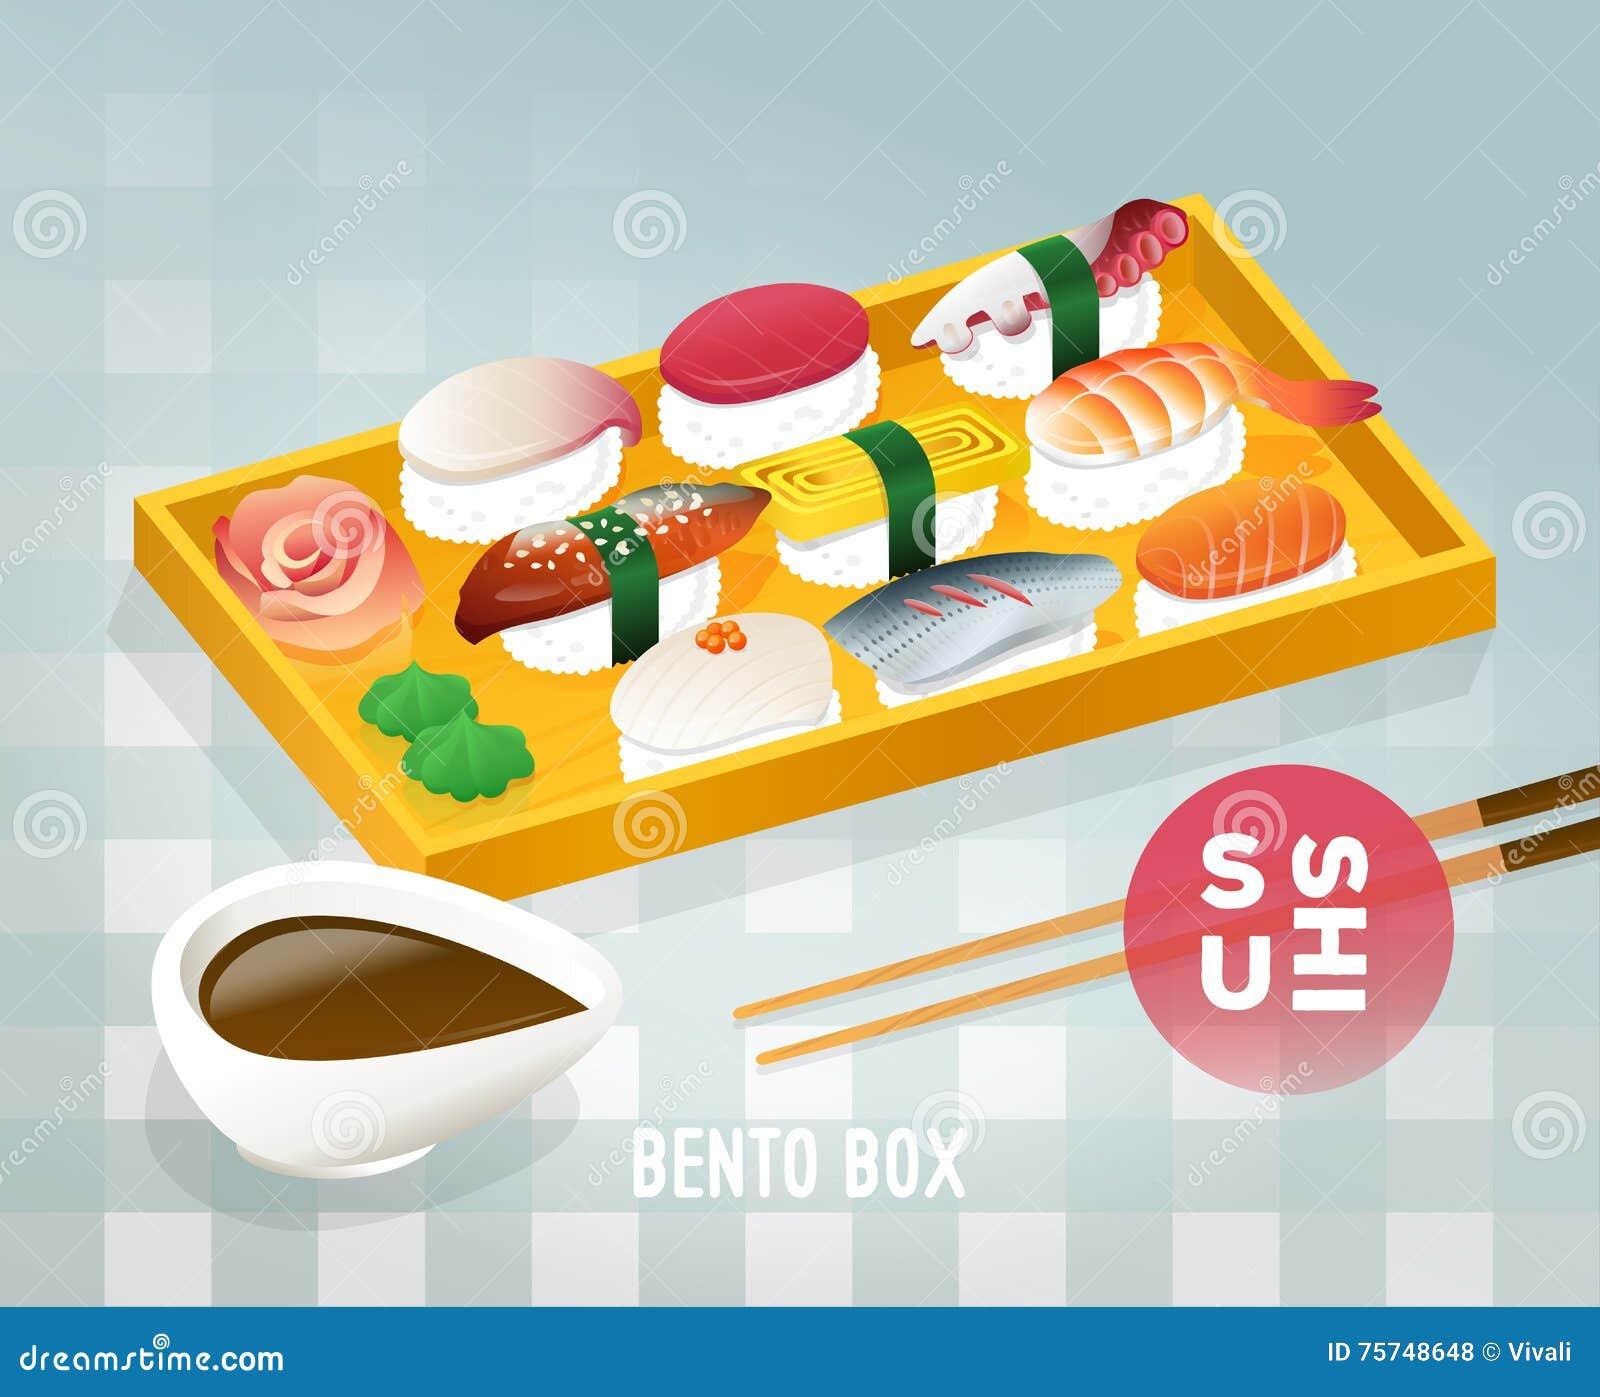 japanese bento food vintage poster design. stock vector